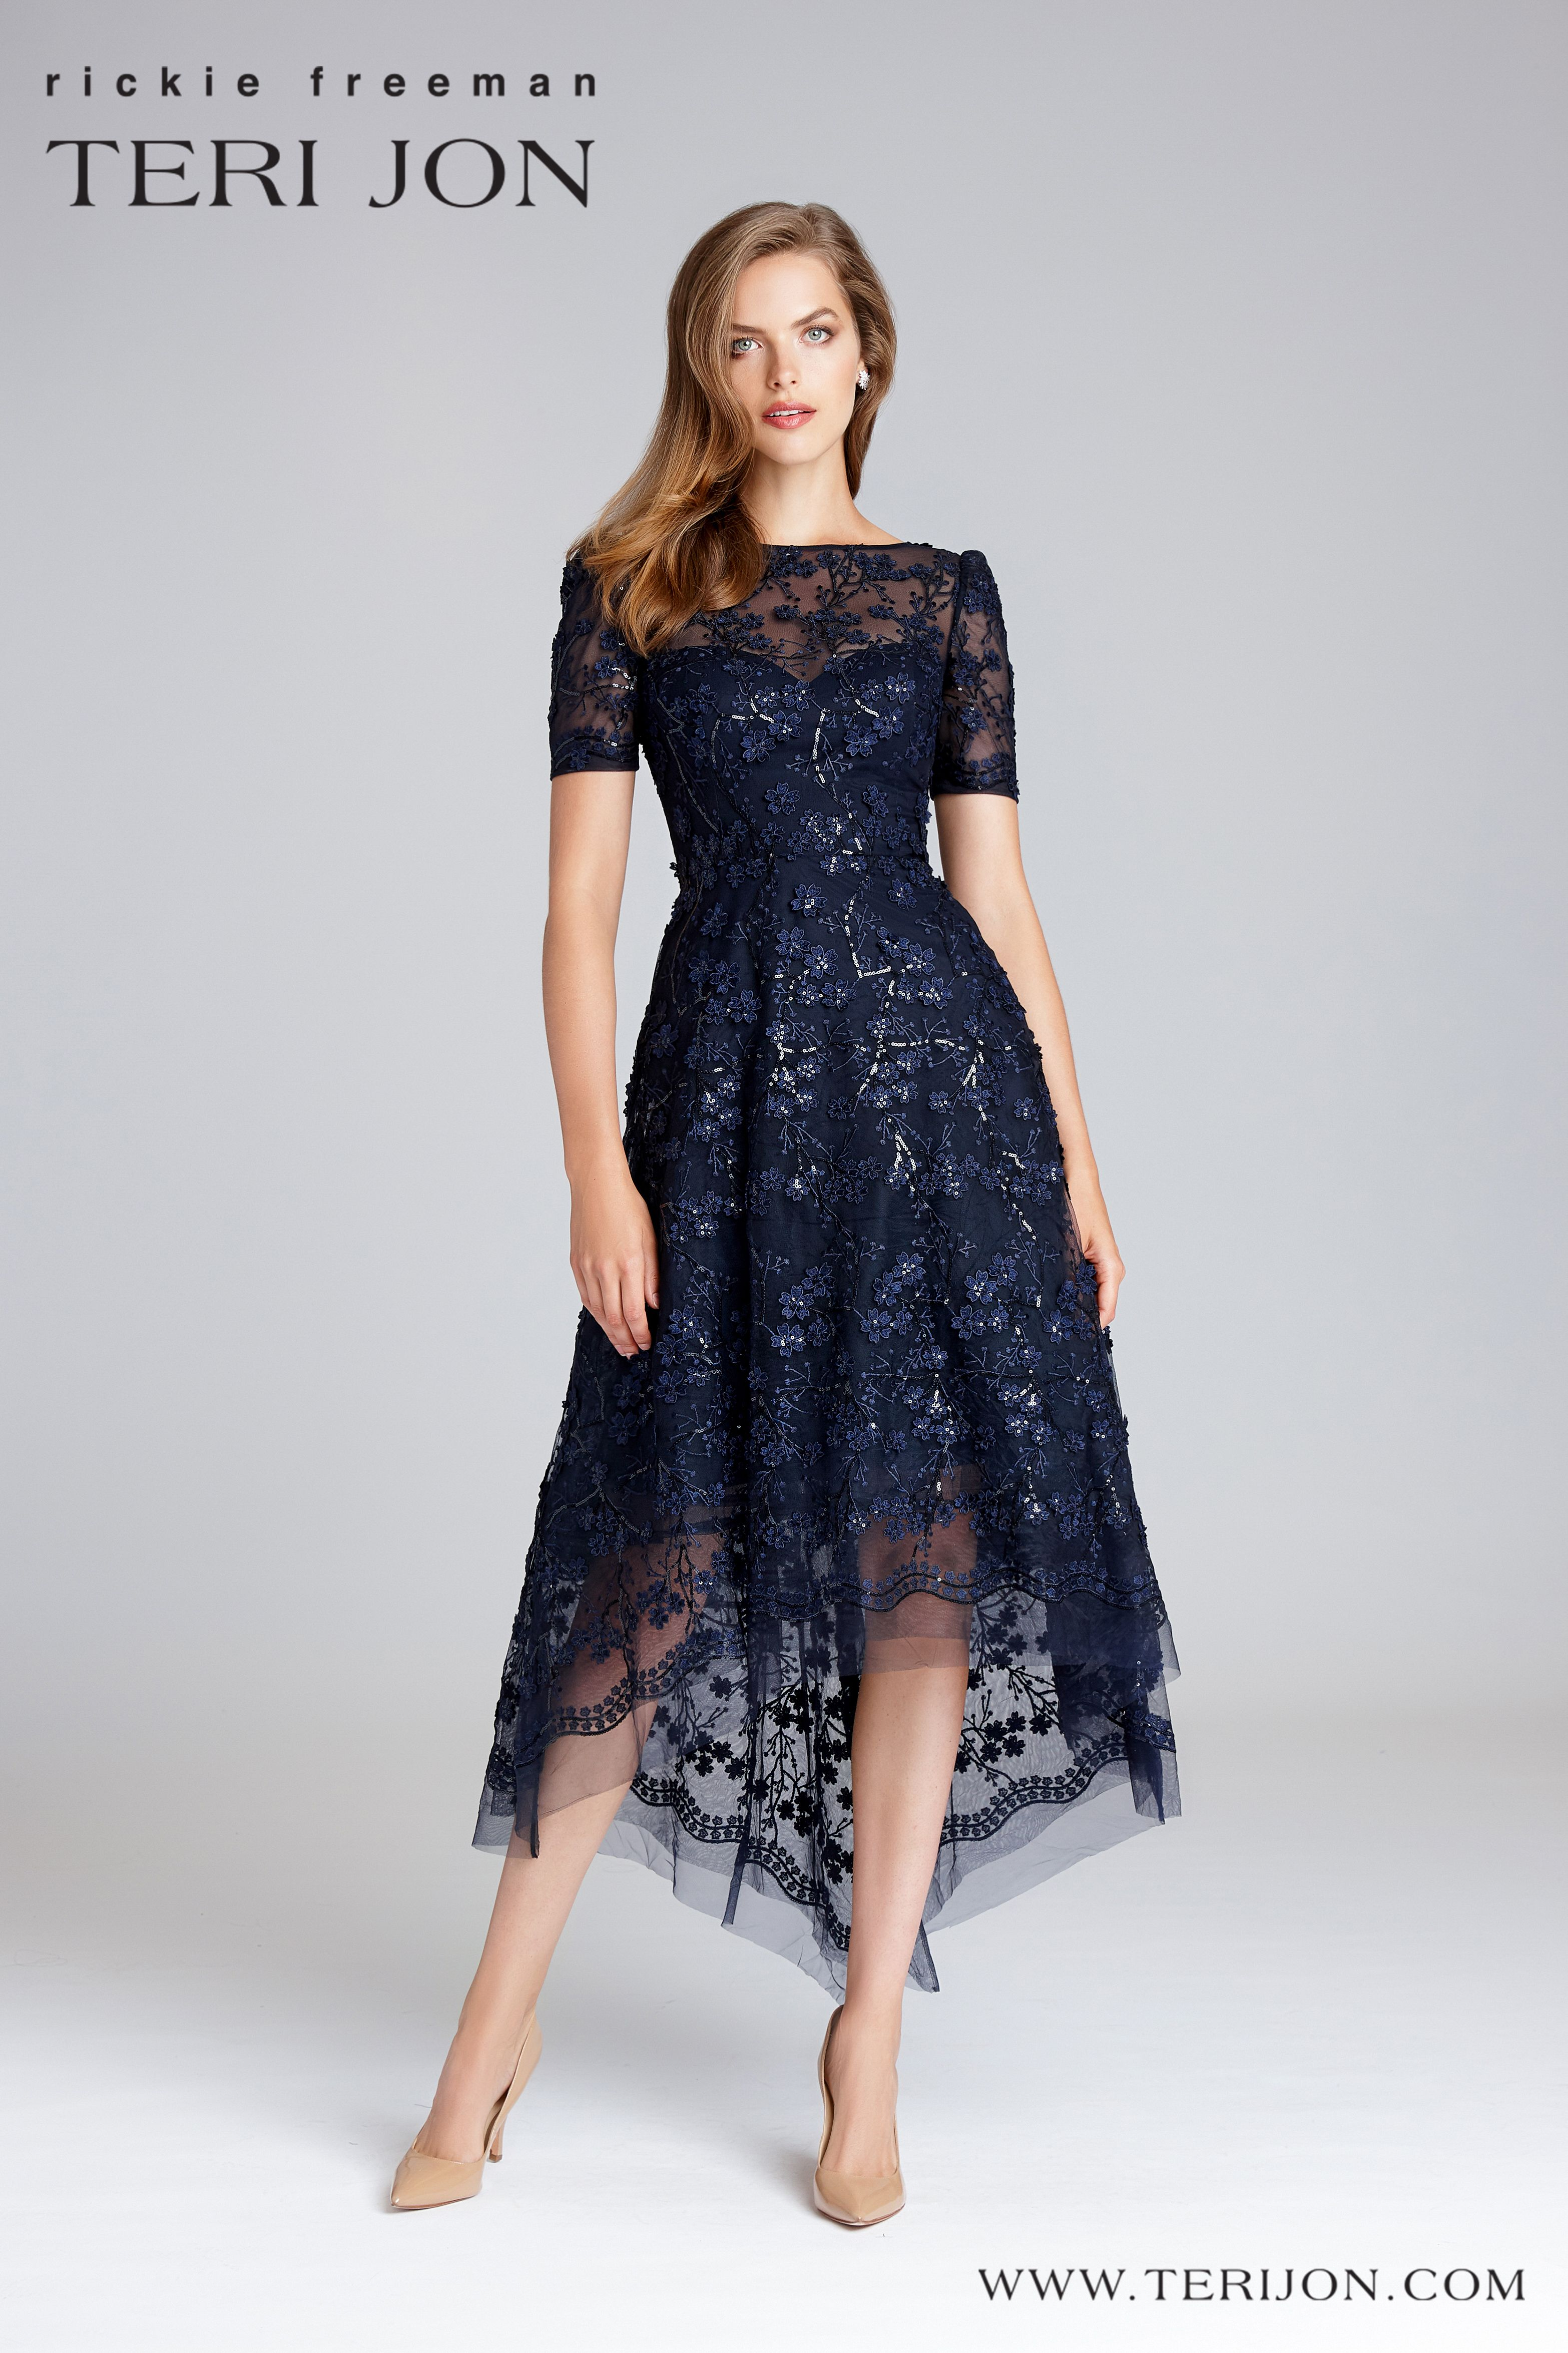 Lace Short Sleeve Tea Length Dress Tea Length Dresses Mother Of Bride Outfits Fancy Dresses [ 4700 x 3133 Pixel ]